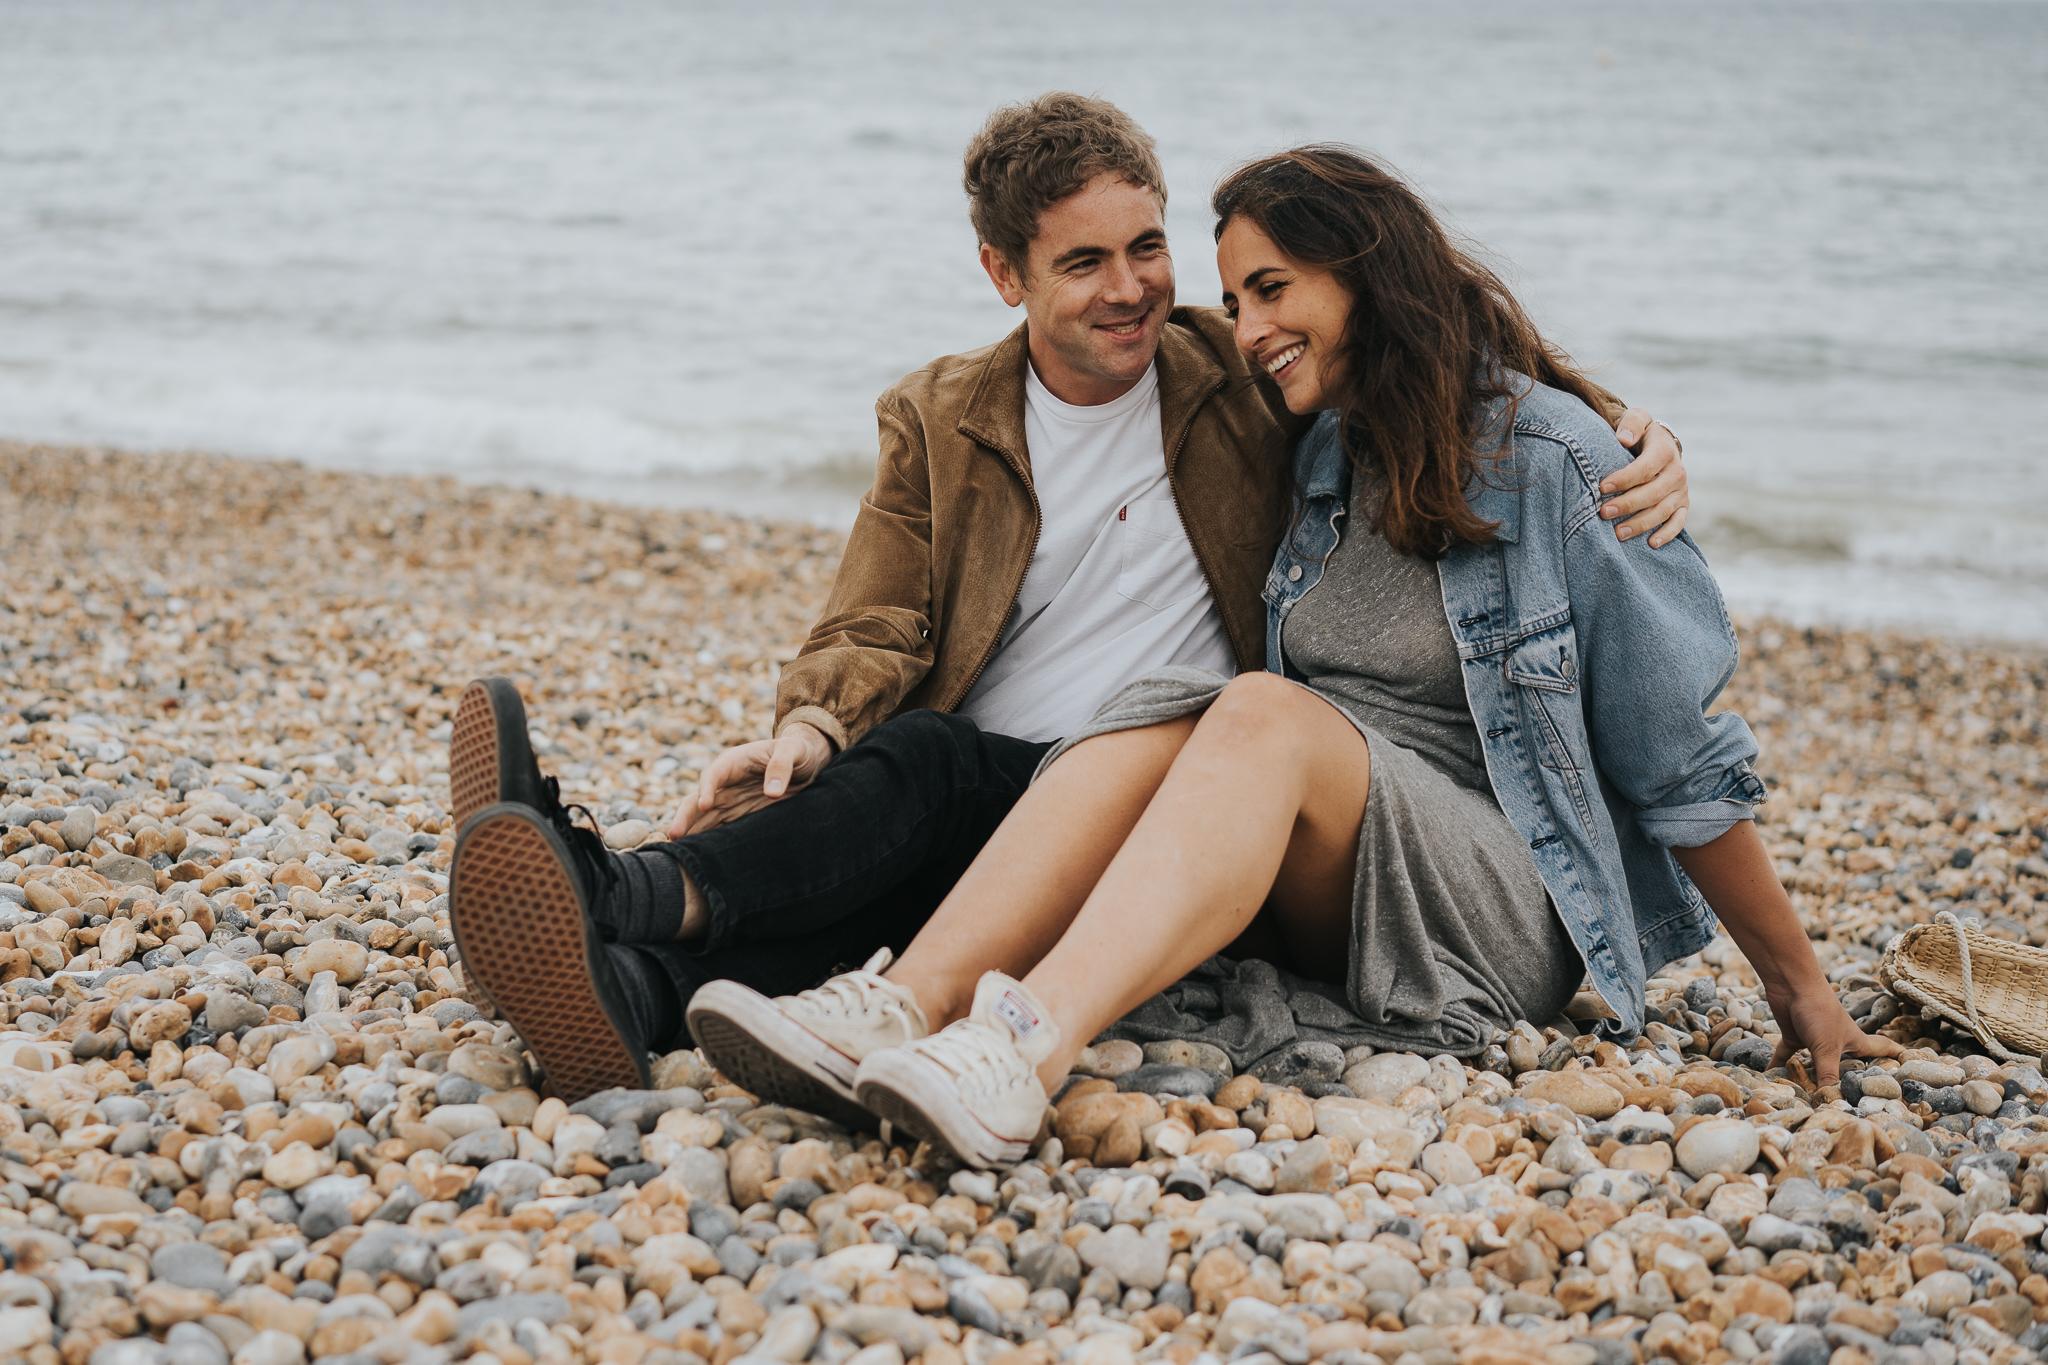 Brighton wedding photographer - Ida + Murray - Tora Baker Photography-17.jpg